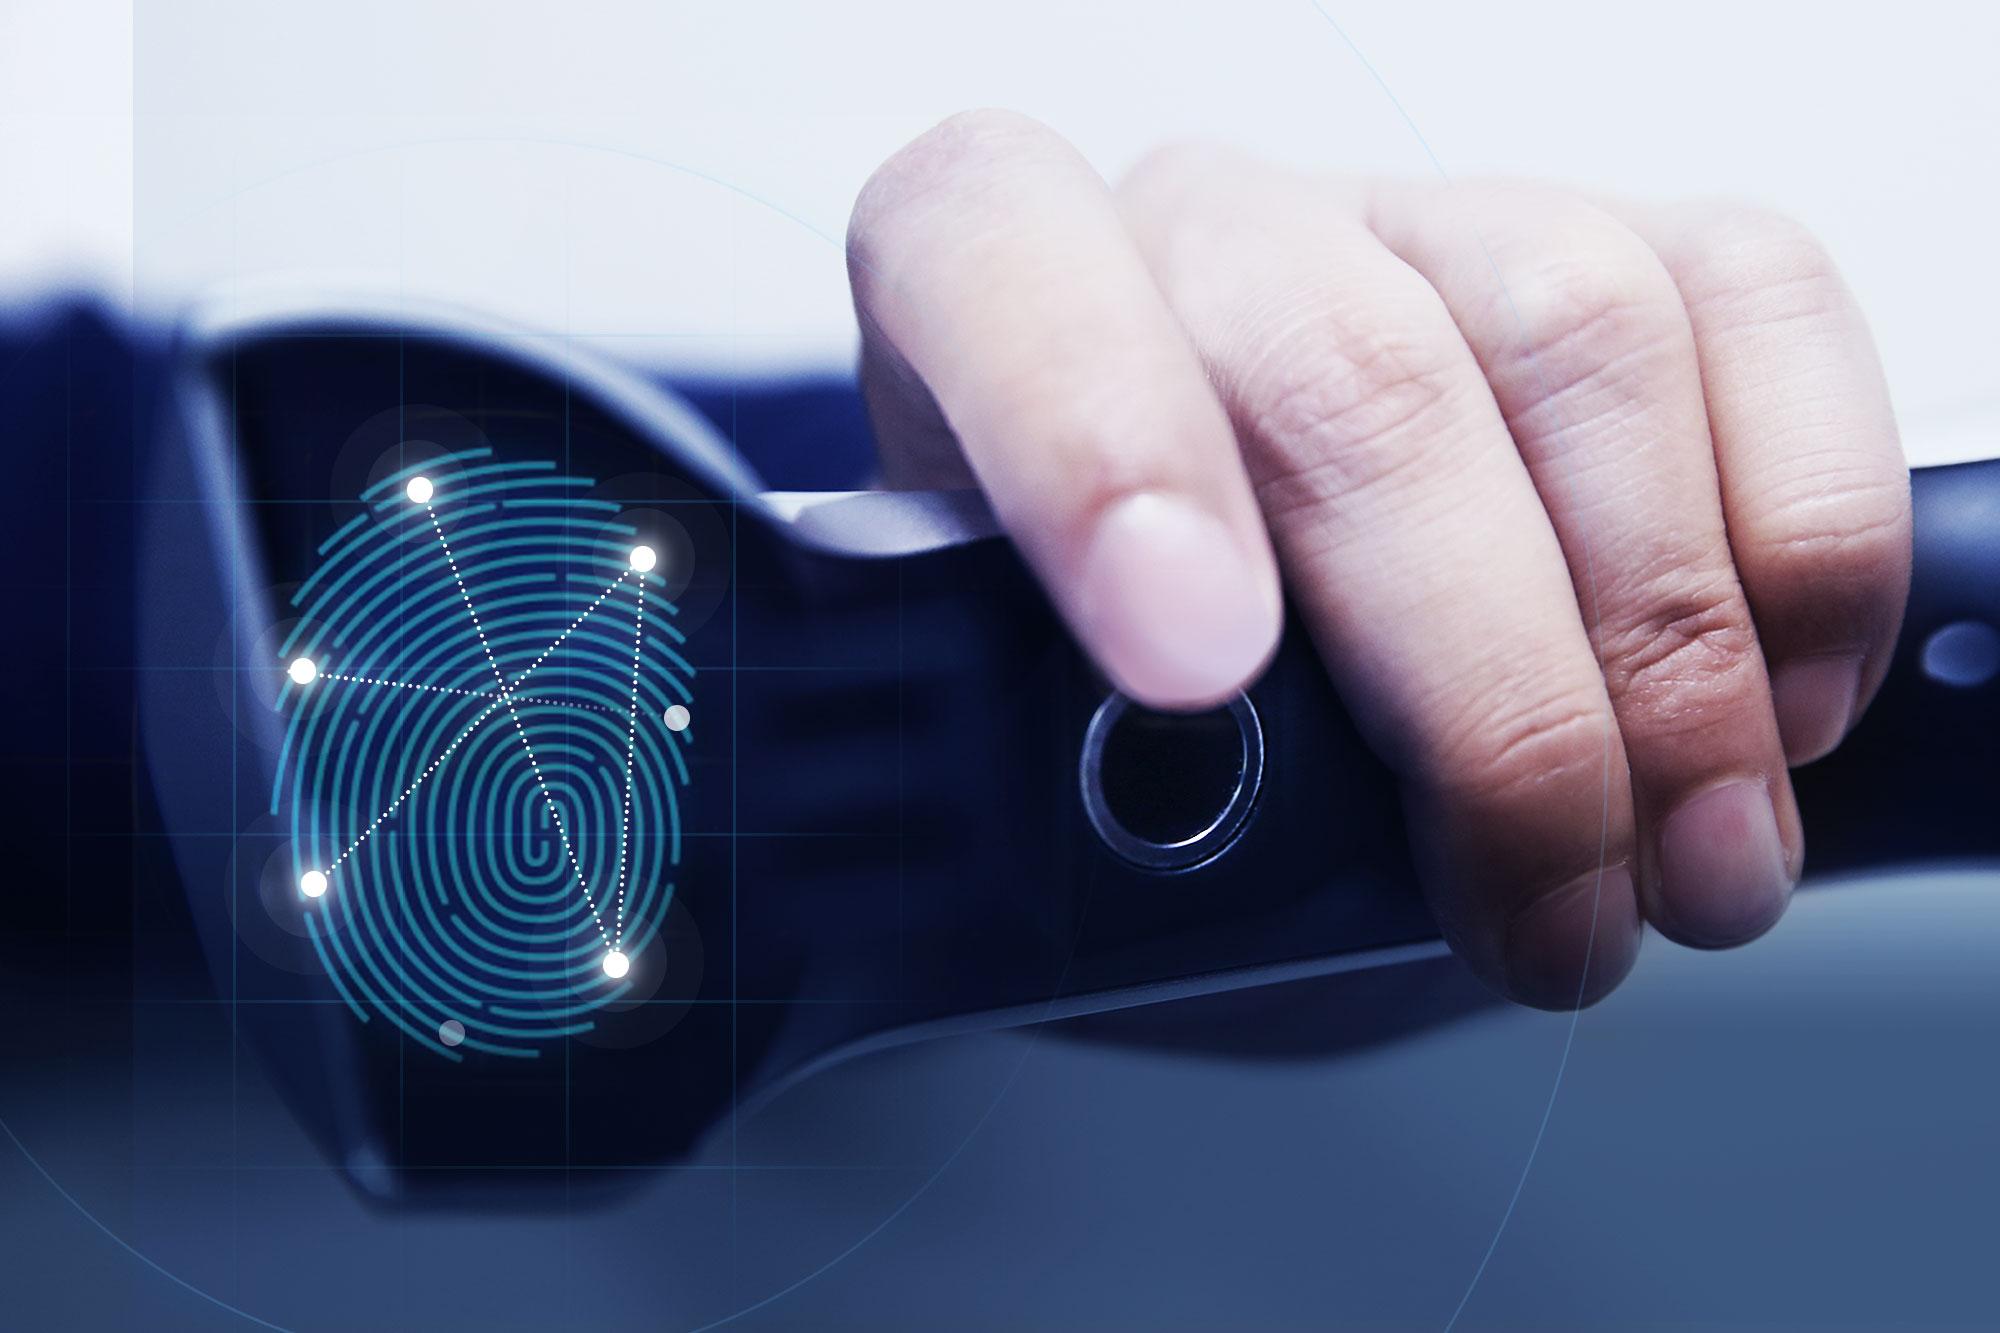 Hyundai finger print scanner button